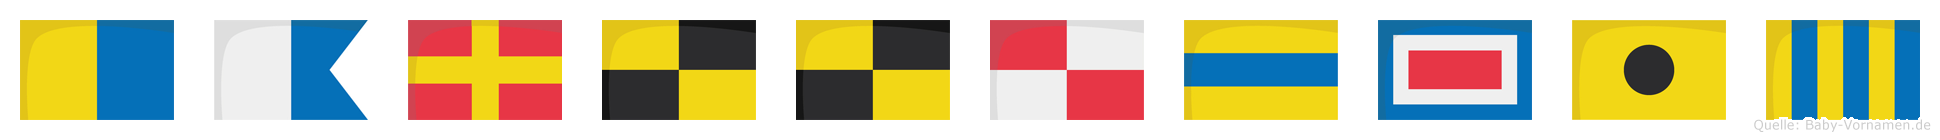 Karlludwig im Flaggenalphabet